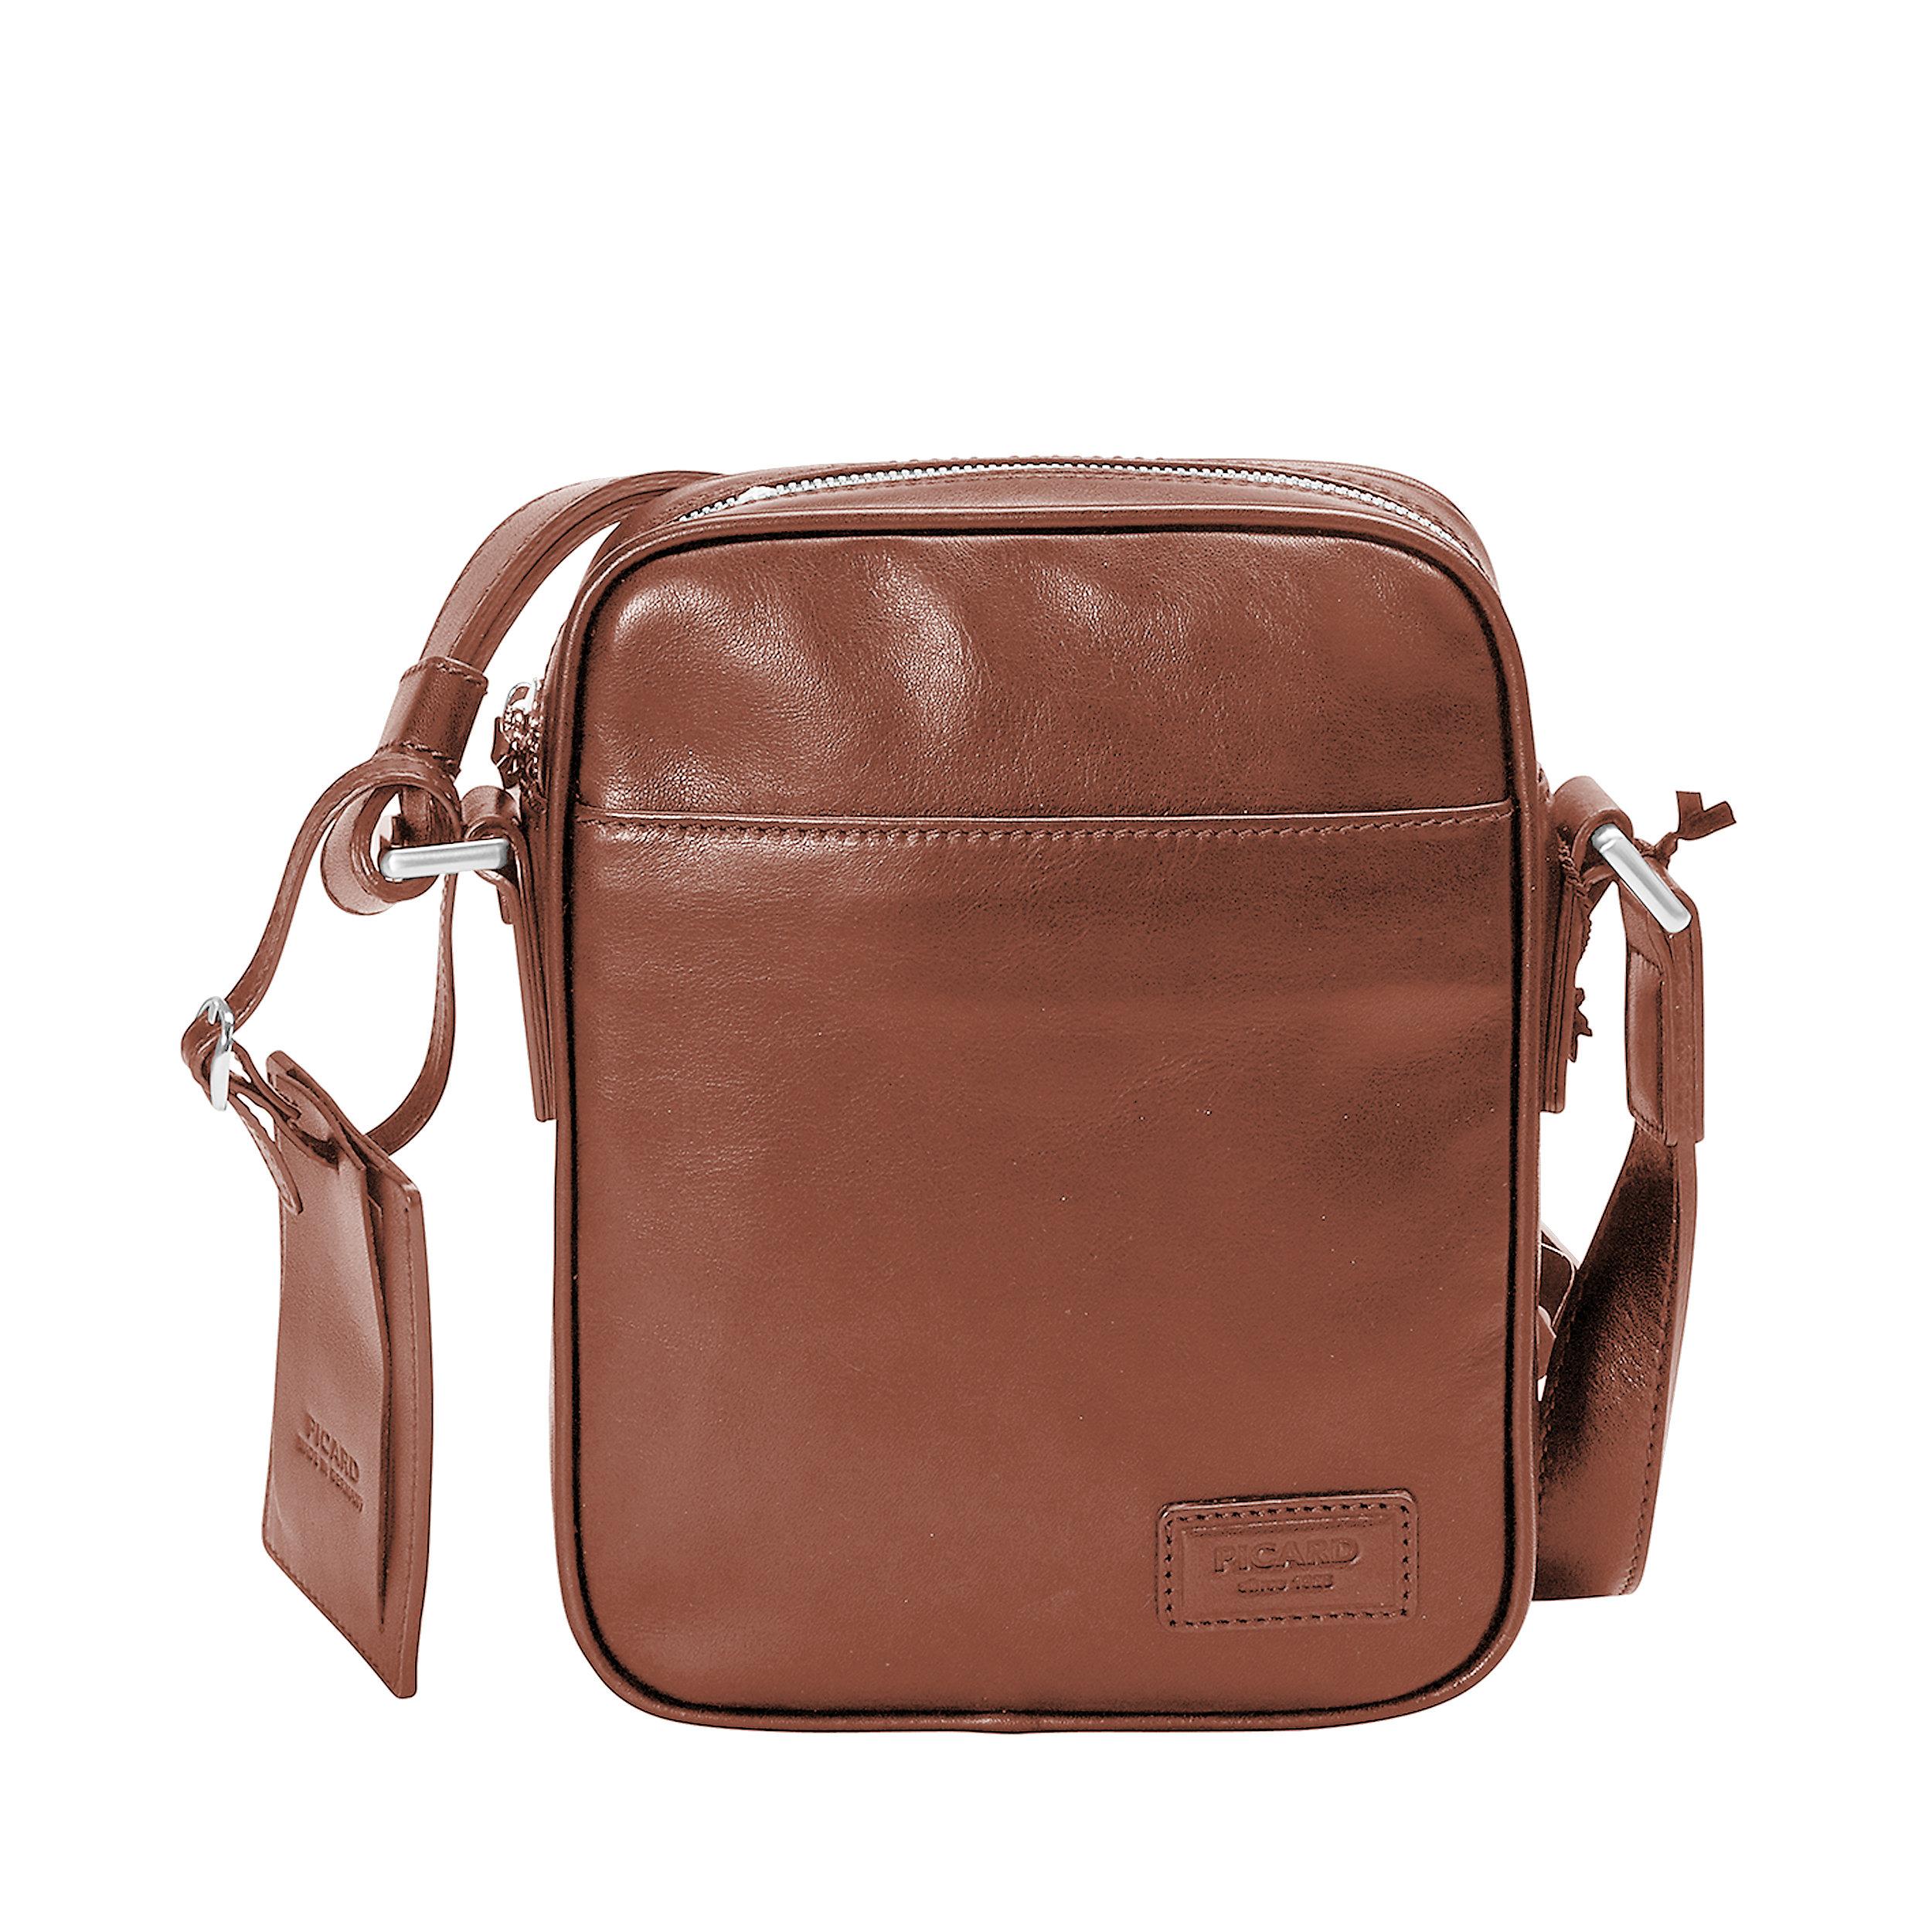 Crossbody Bag Authentic